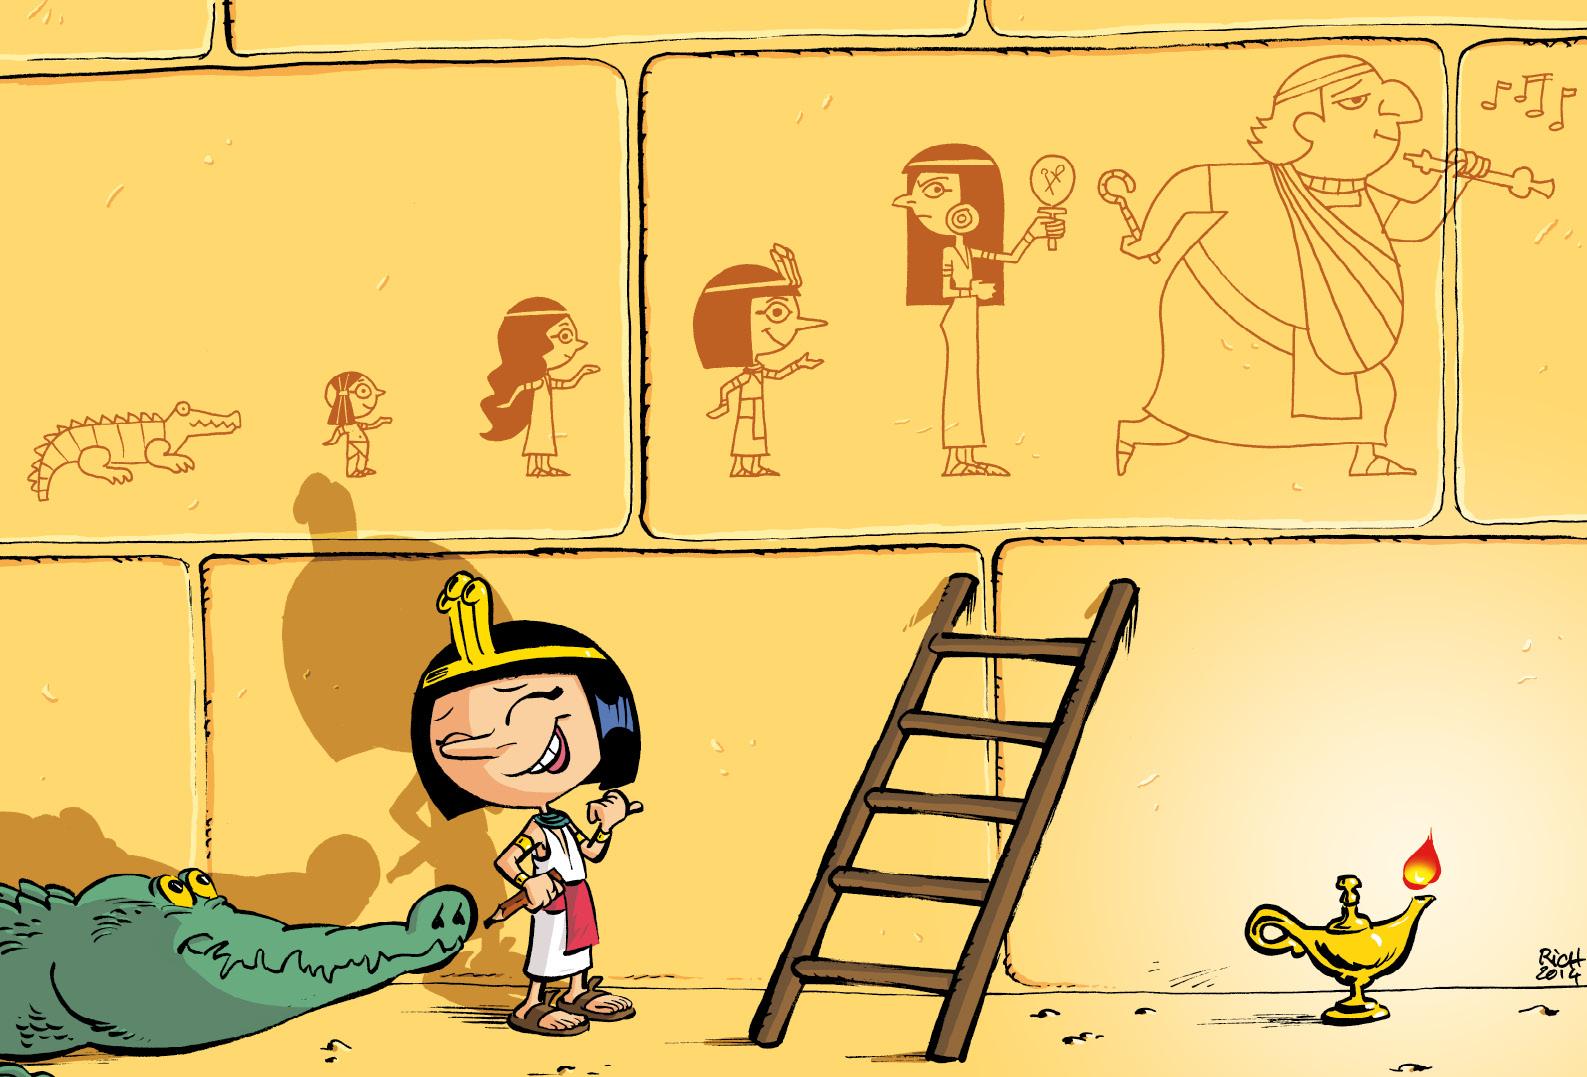 Cléo la petite pharaonne page de garde